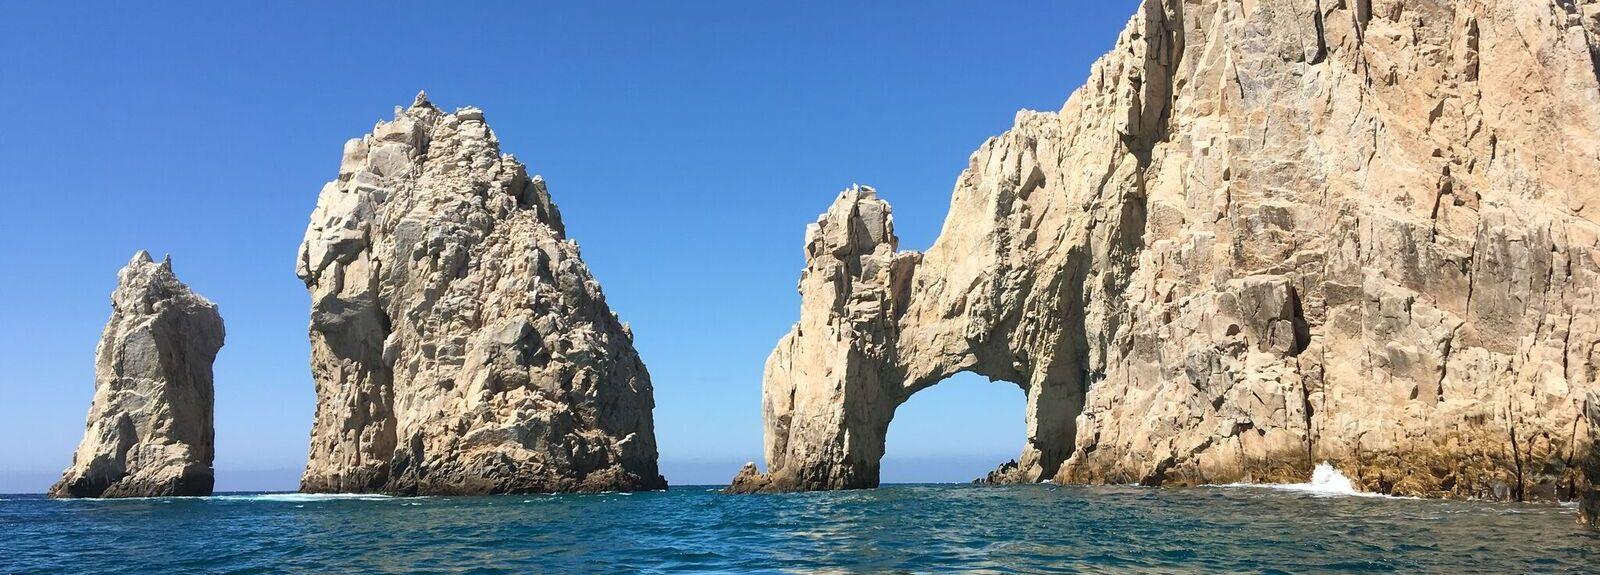 Hacienda Beach Club & Residences (Cabo San Lucas, Basse-Californie du Sud, Mexique)